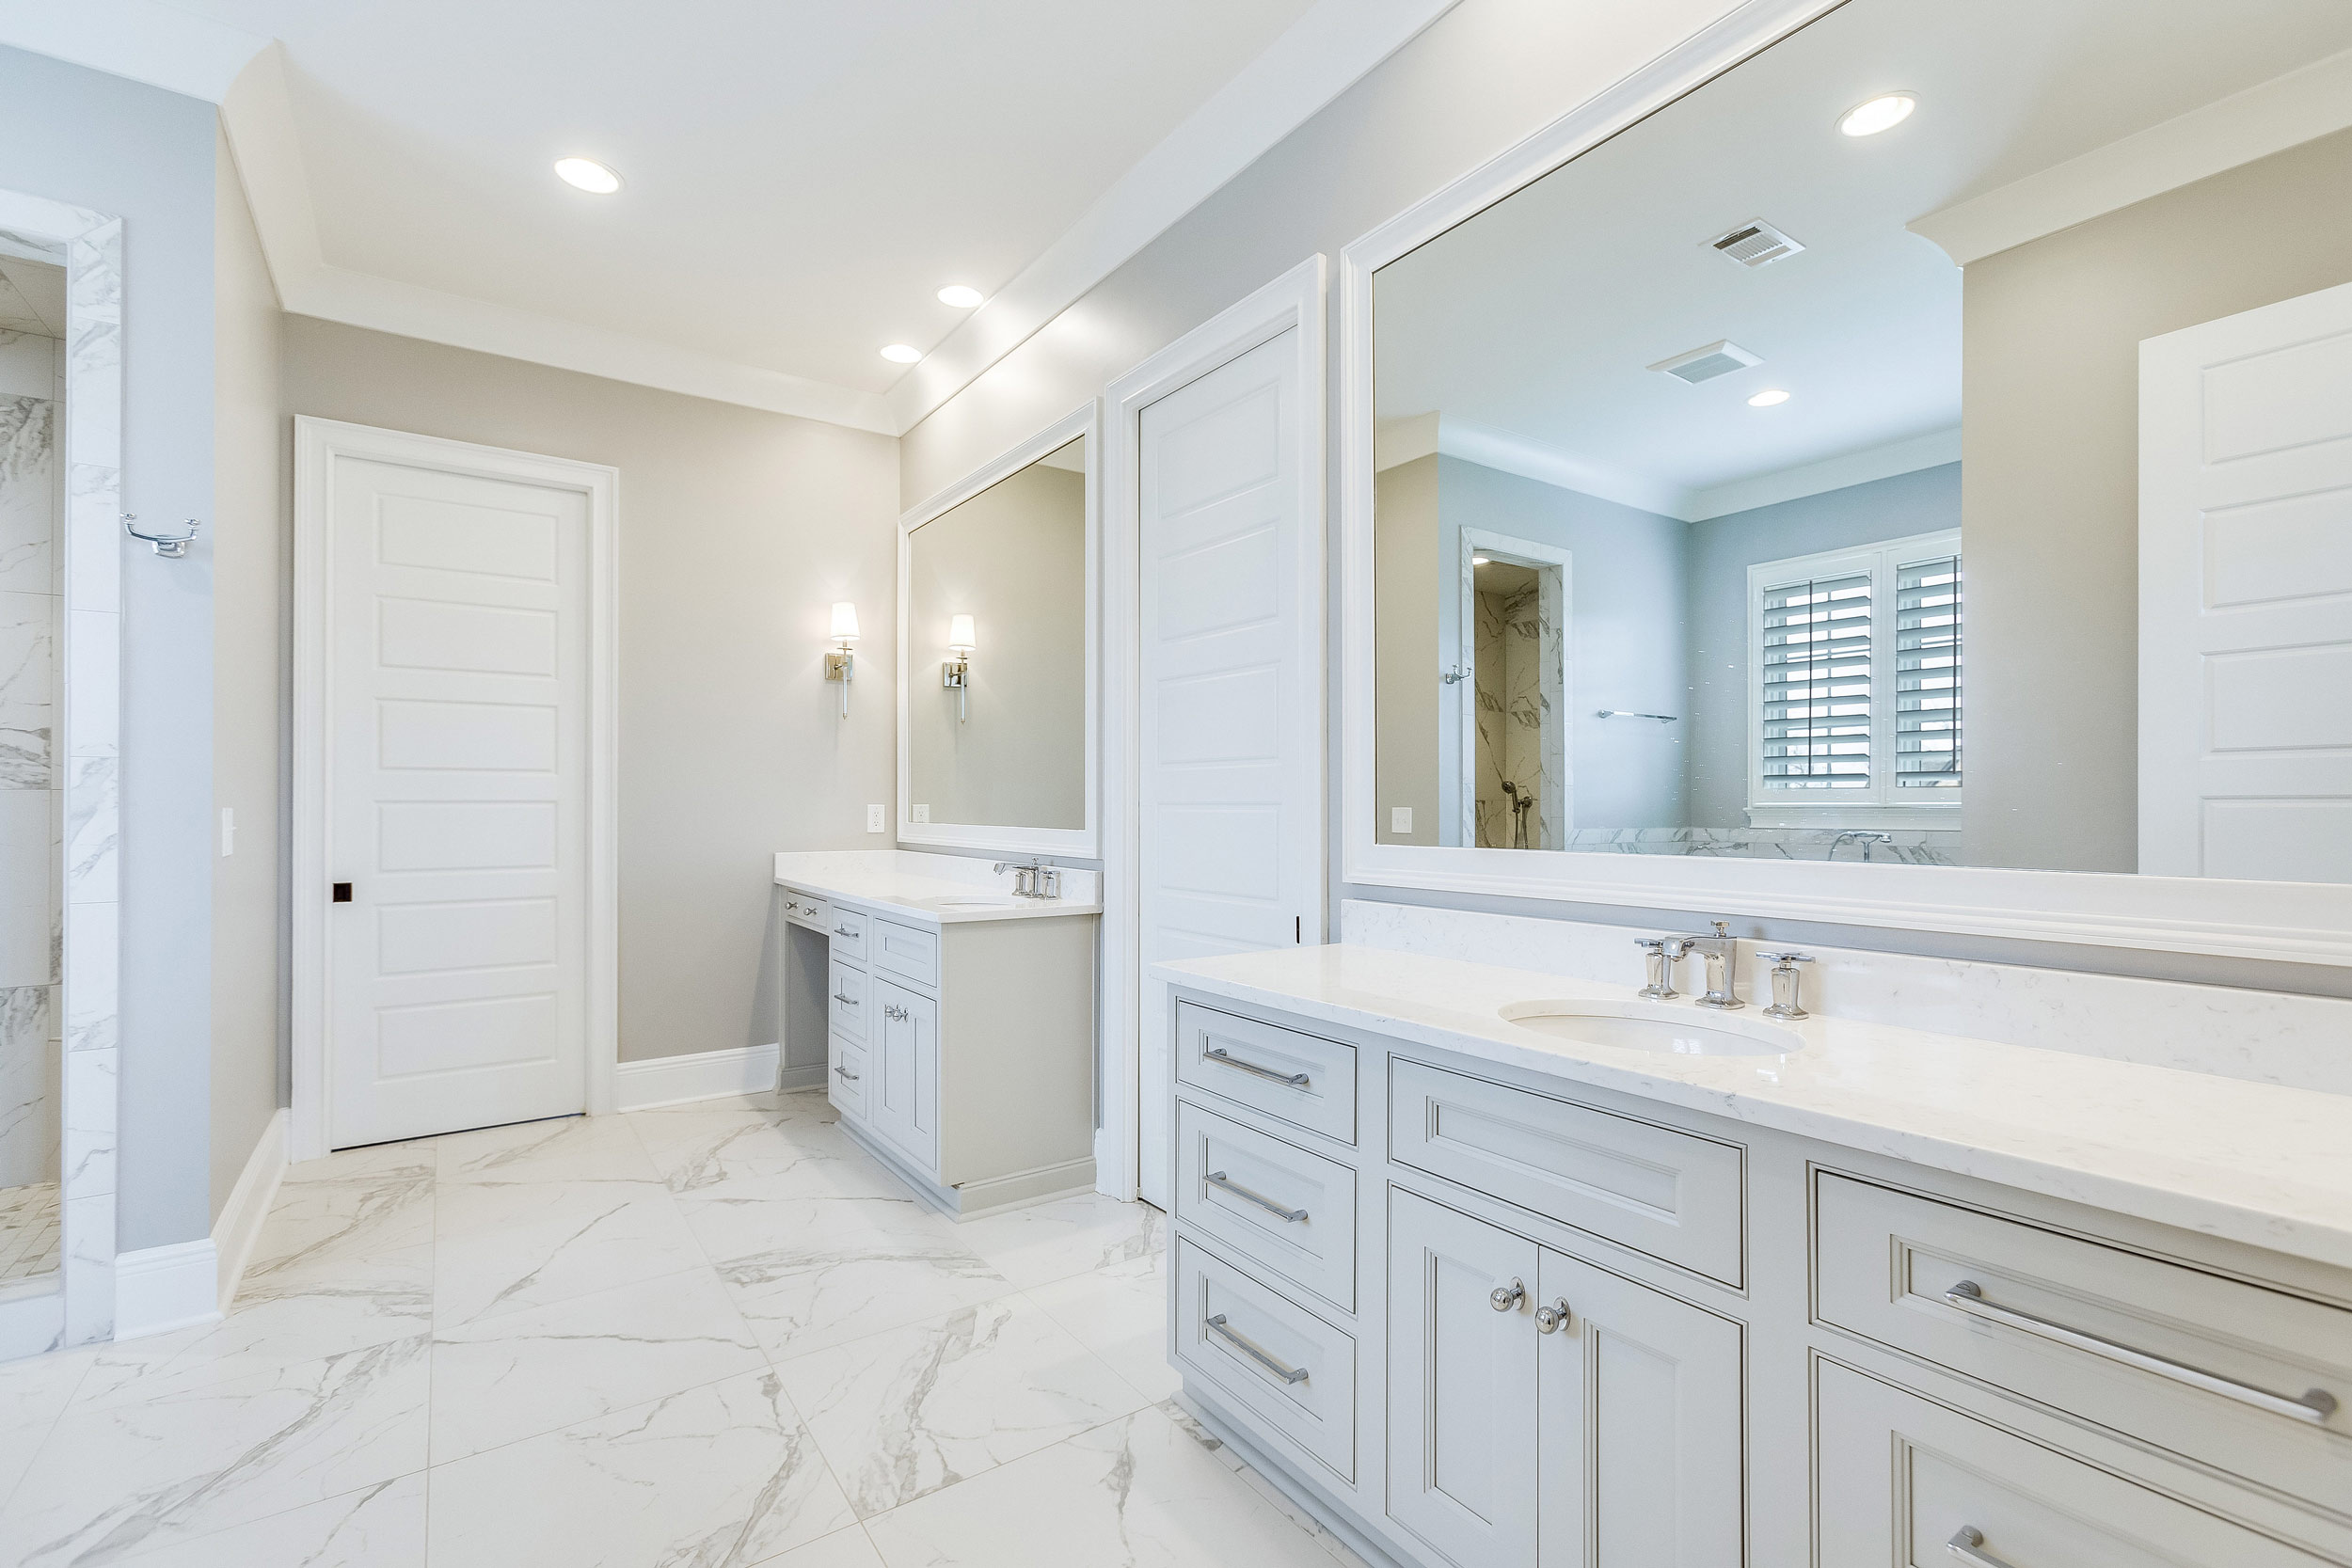 Master Bathroom Lighting Design Tips